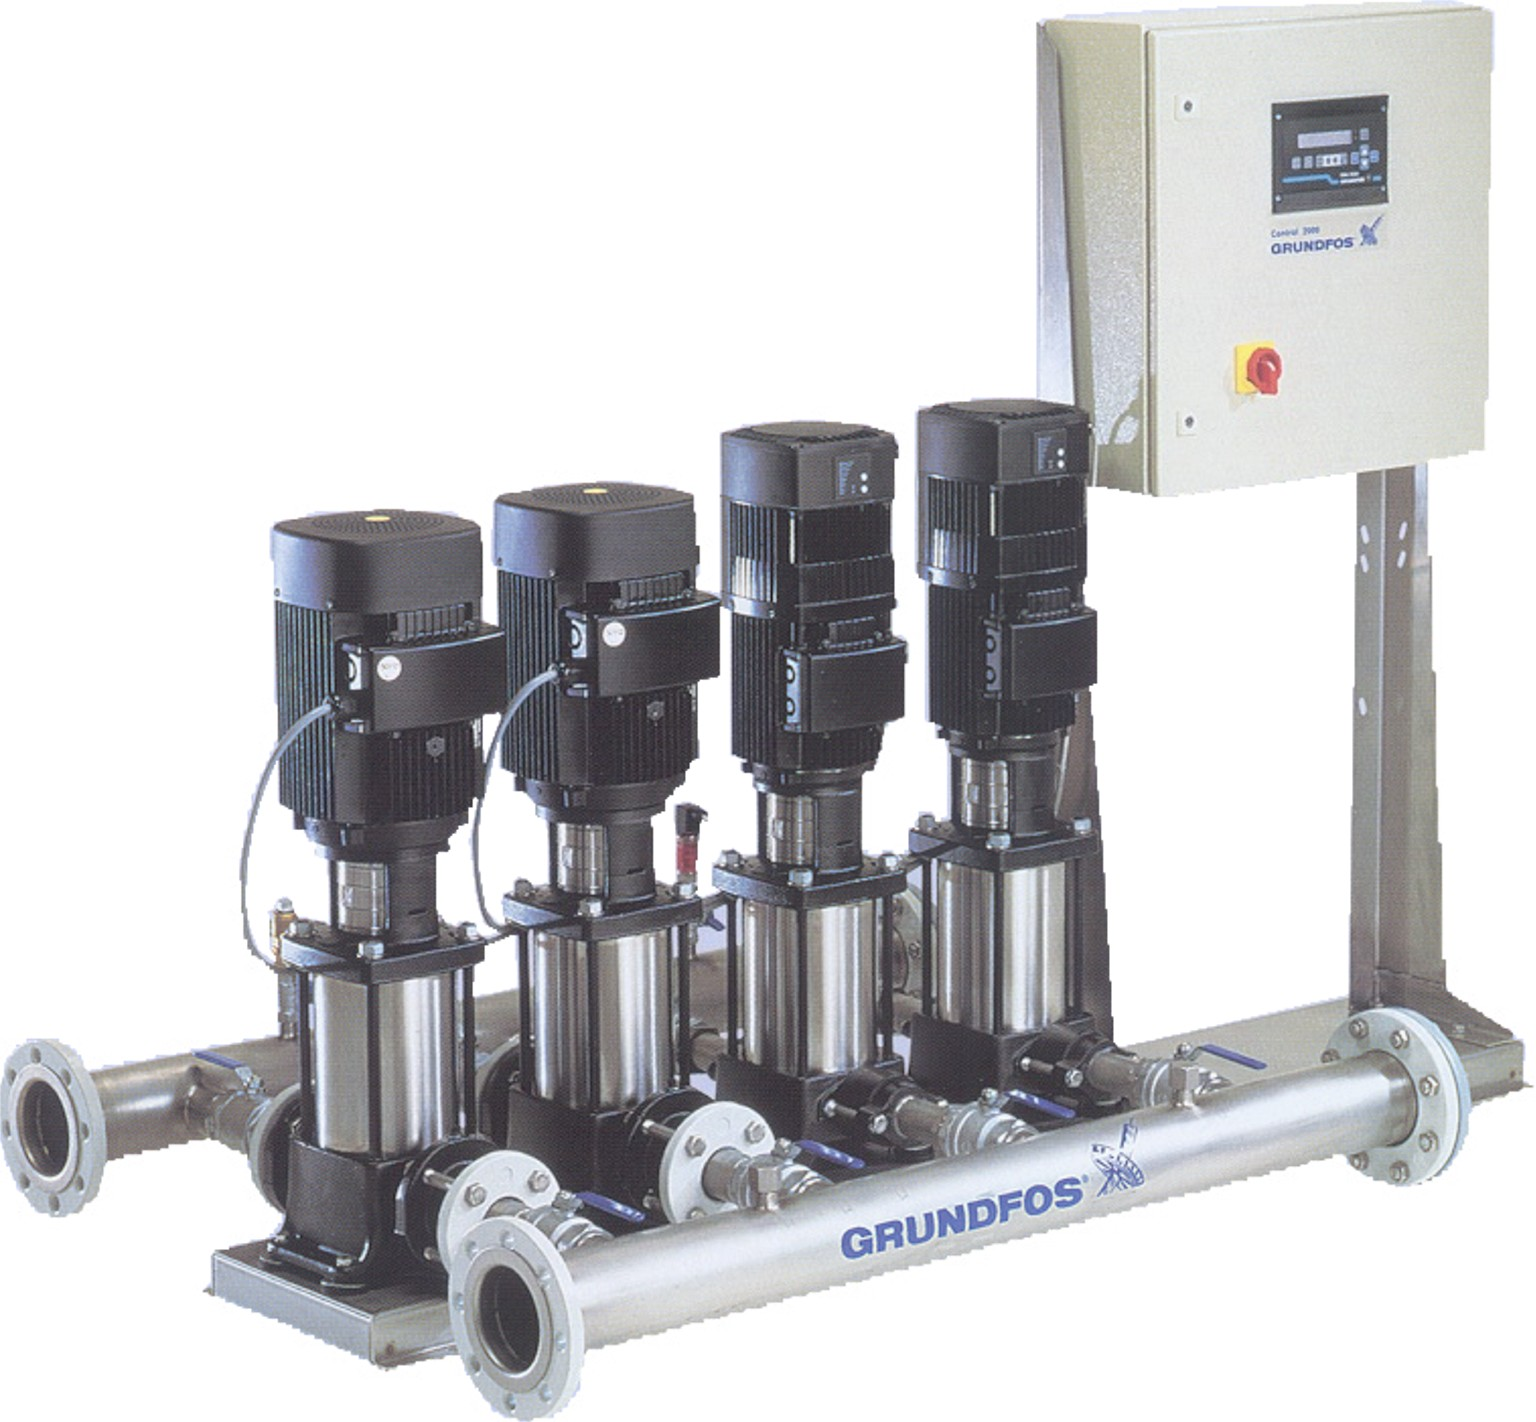 Grundfos Booster Pumps